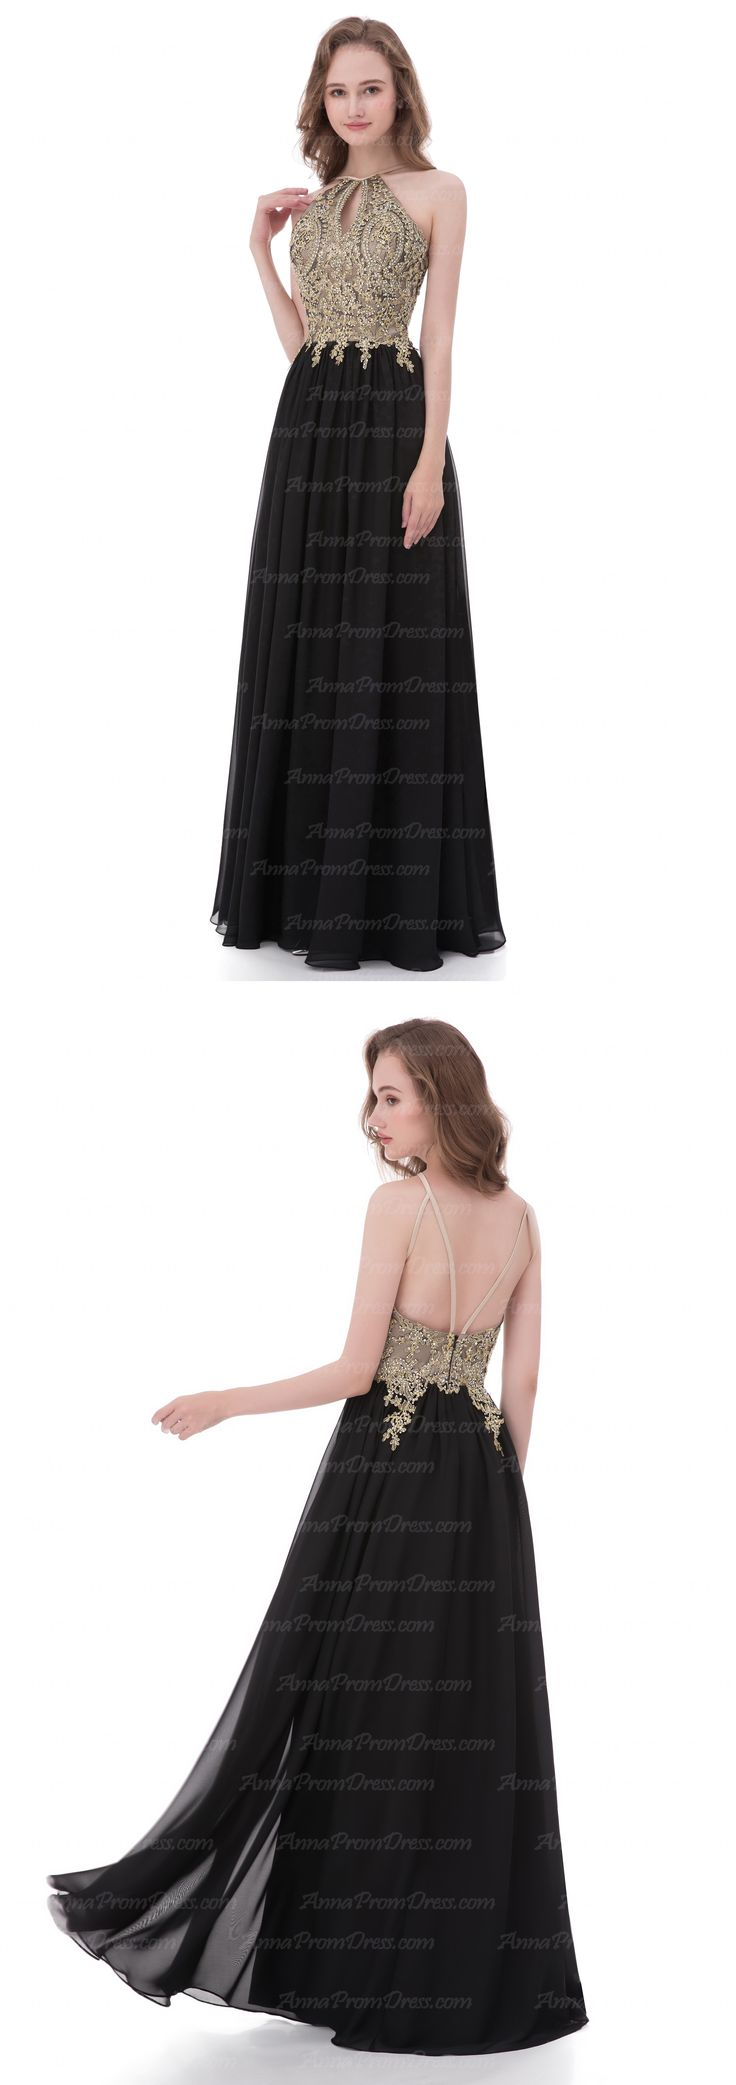 Black Prom Dresses A-line Prom Dress Halter Prom dress cheap prom dresses prom dresses 2018 Chiffon Long Sexy Prom Dress #annapromdress #prom #promdress #evening #eveningdress #dance #longdress #longpromdress #fashion #style #dress